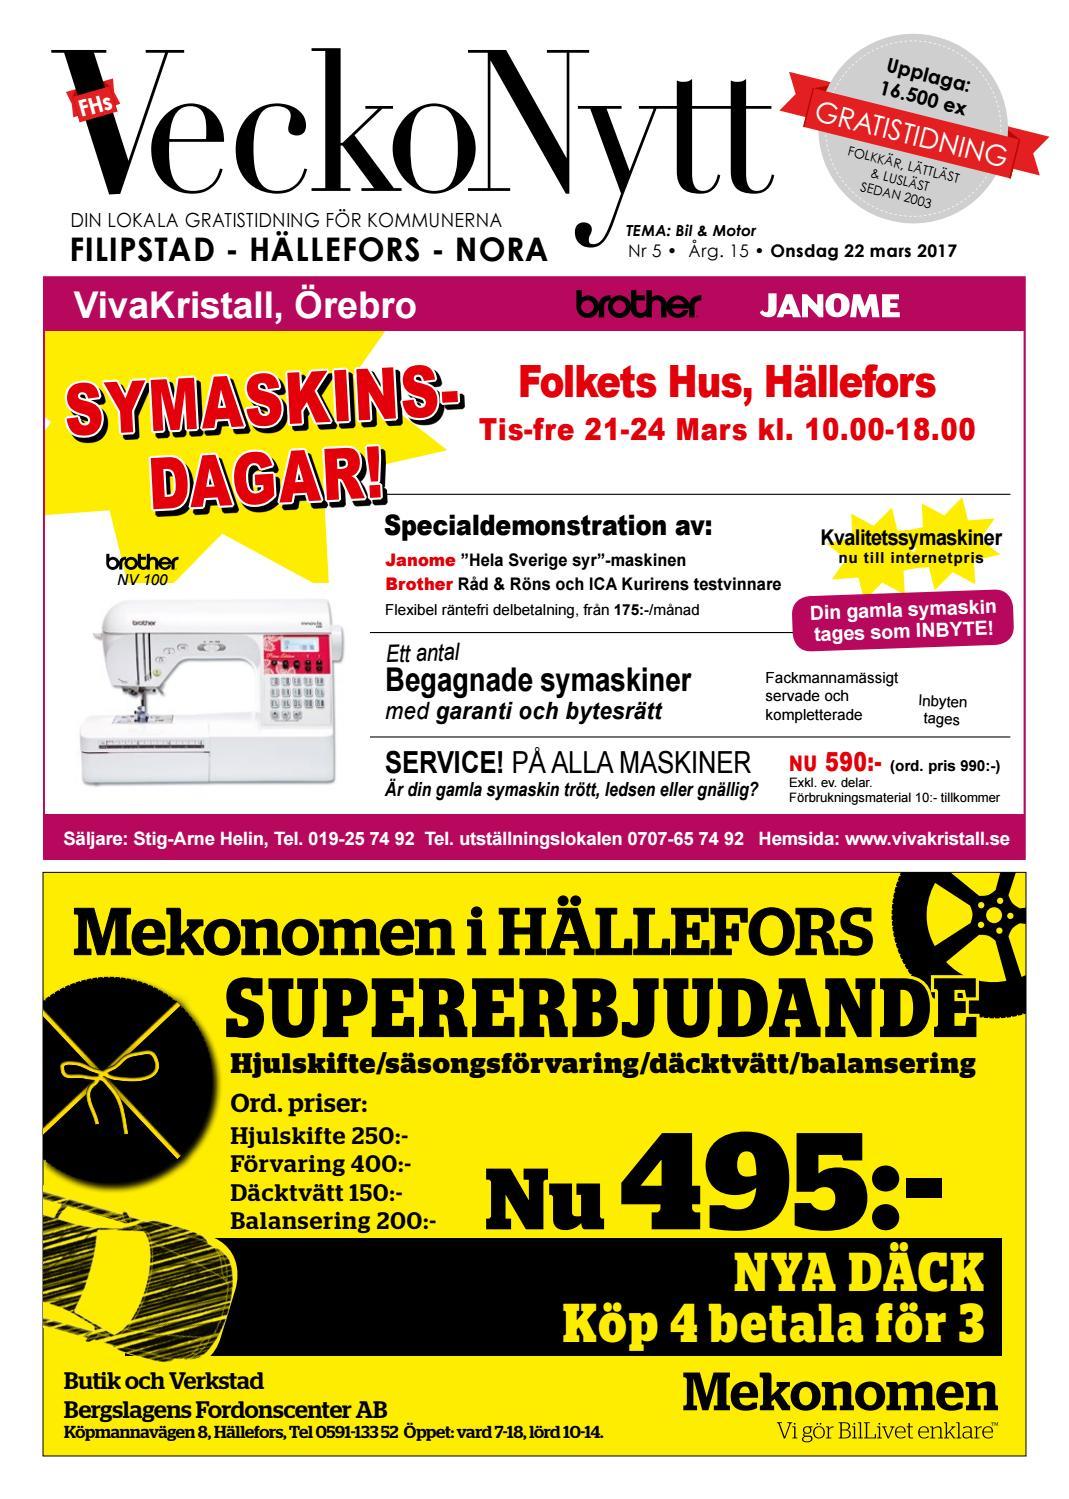 Emelie Gjersvold, Rmensvgen 35, rsta | satisfaction-survey.net